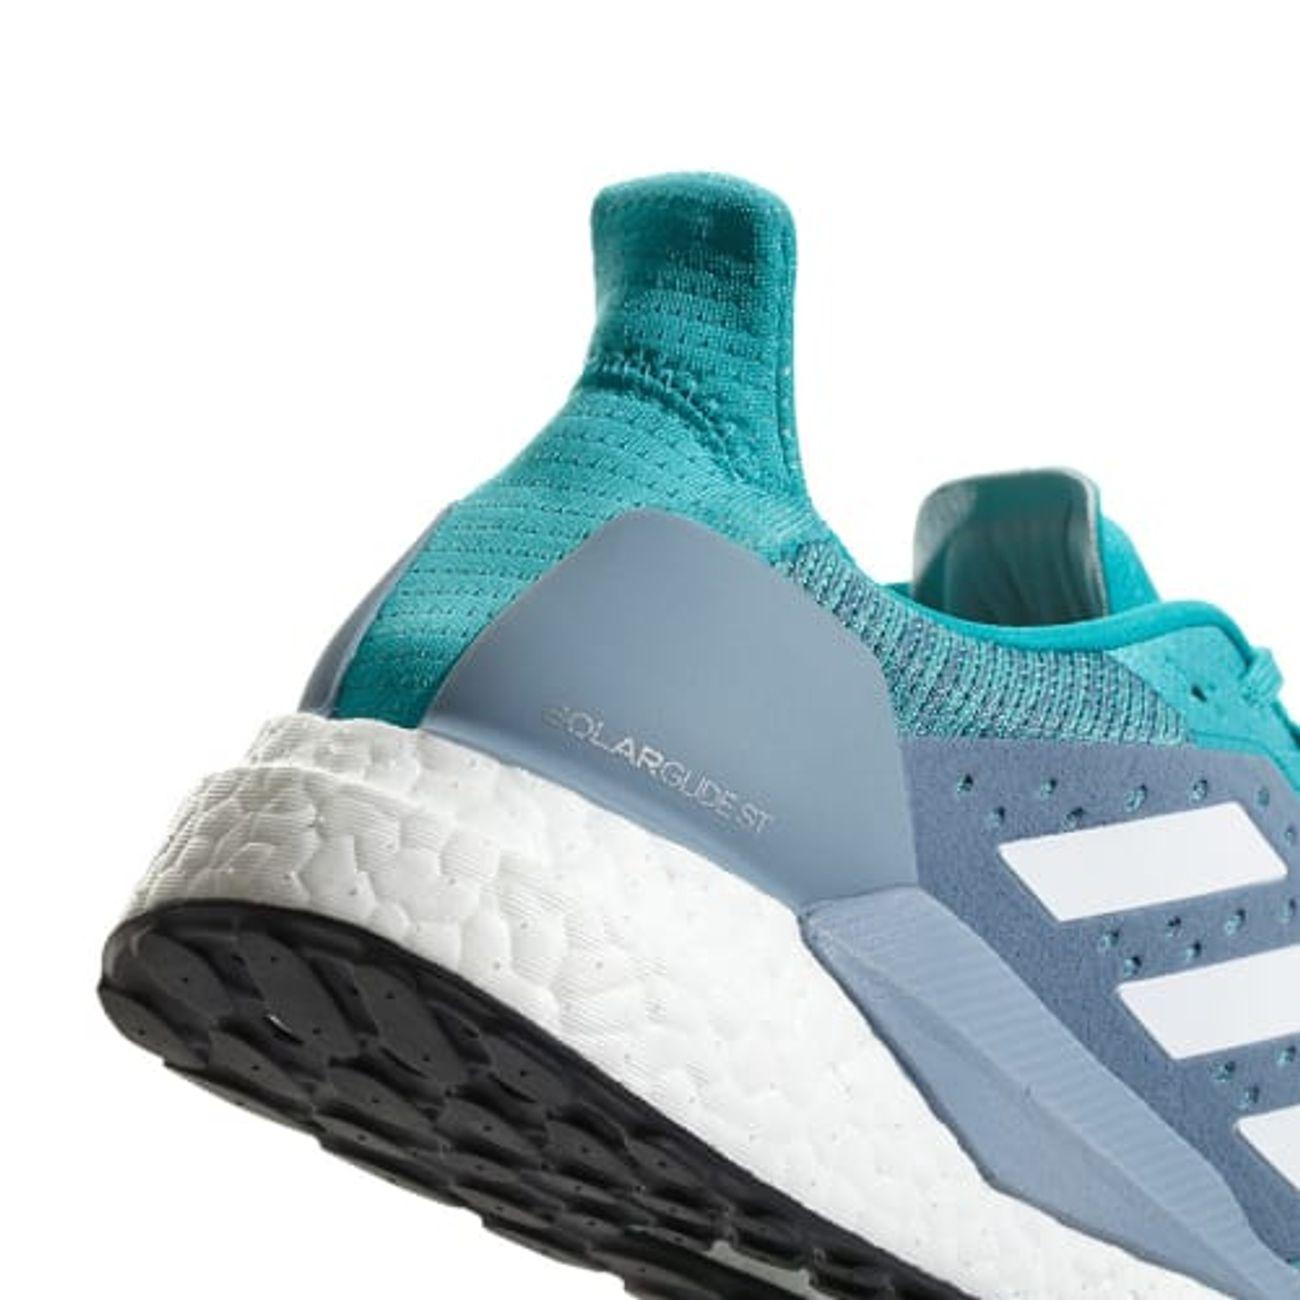 Adidas Pied St Course Solar Femme Chaussures À Glide LSUpqMVzG